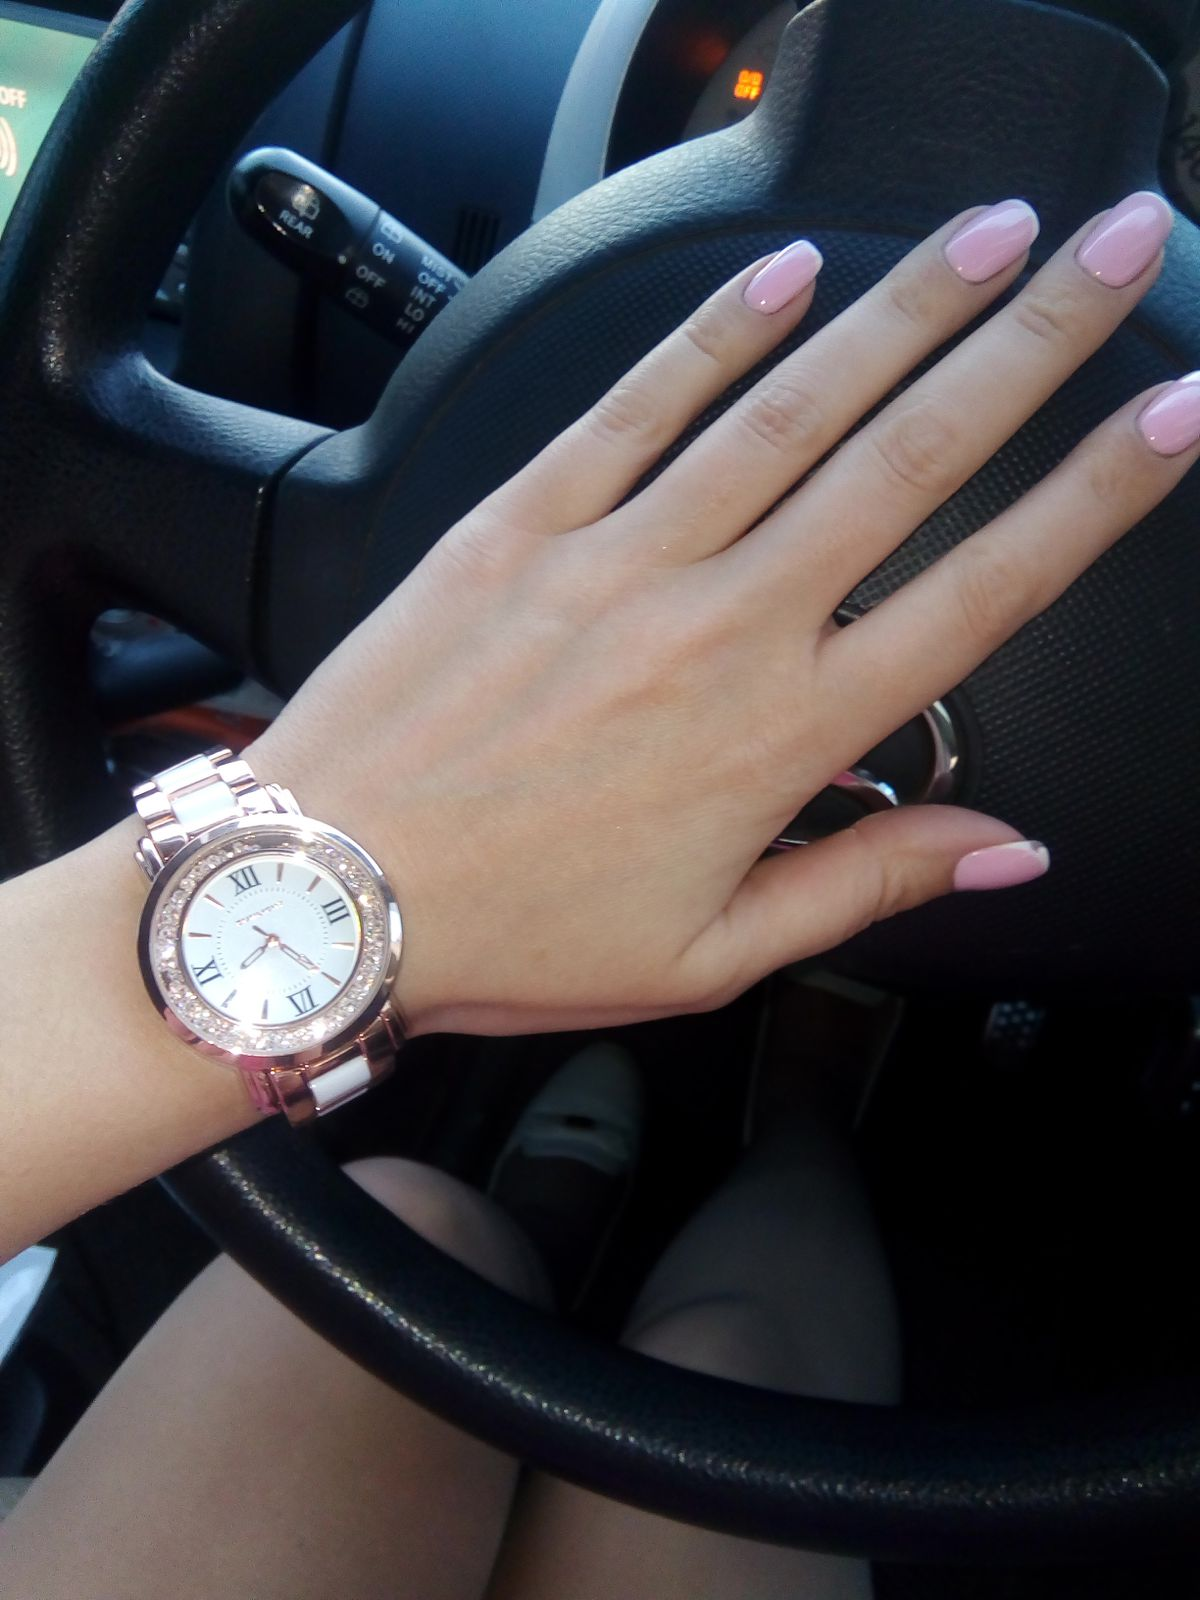 Часики просто находка,не нарадуюсь на них!!!)))